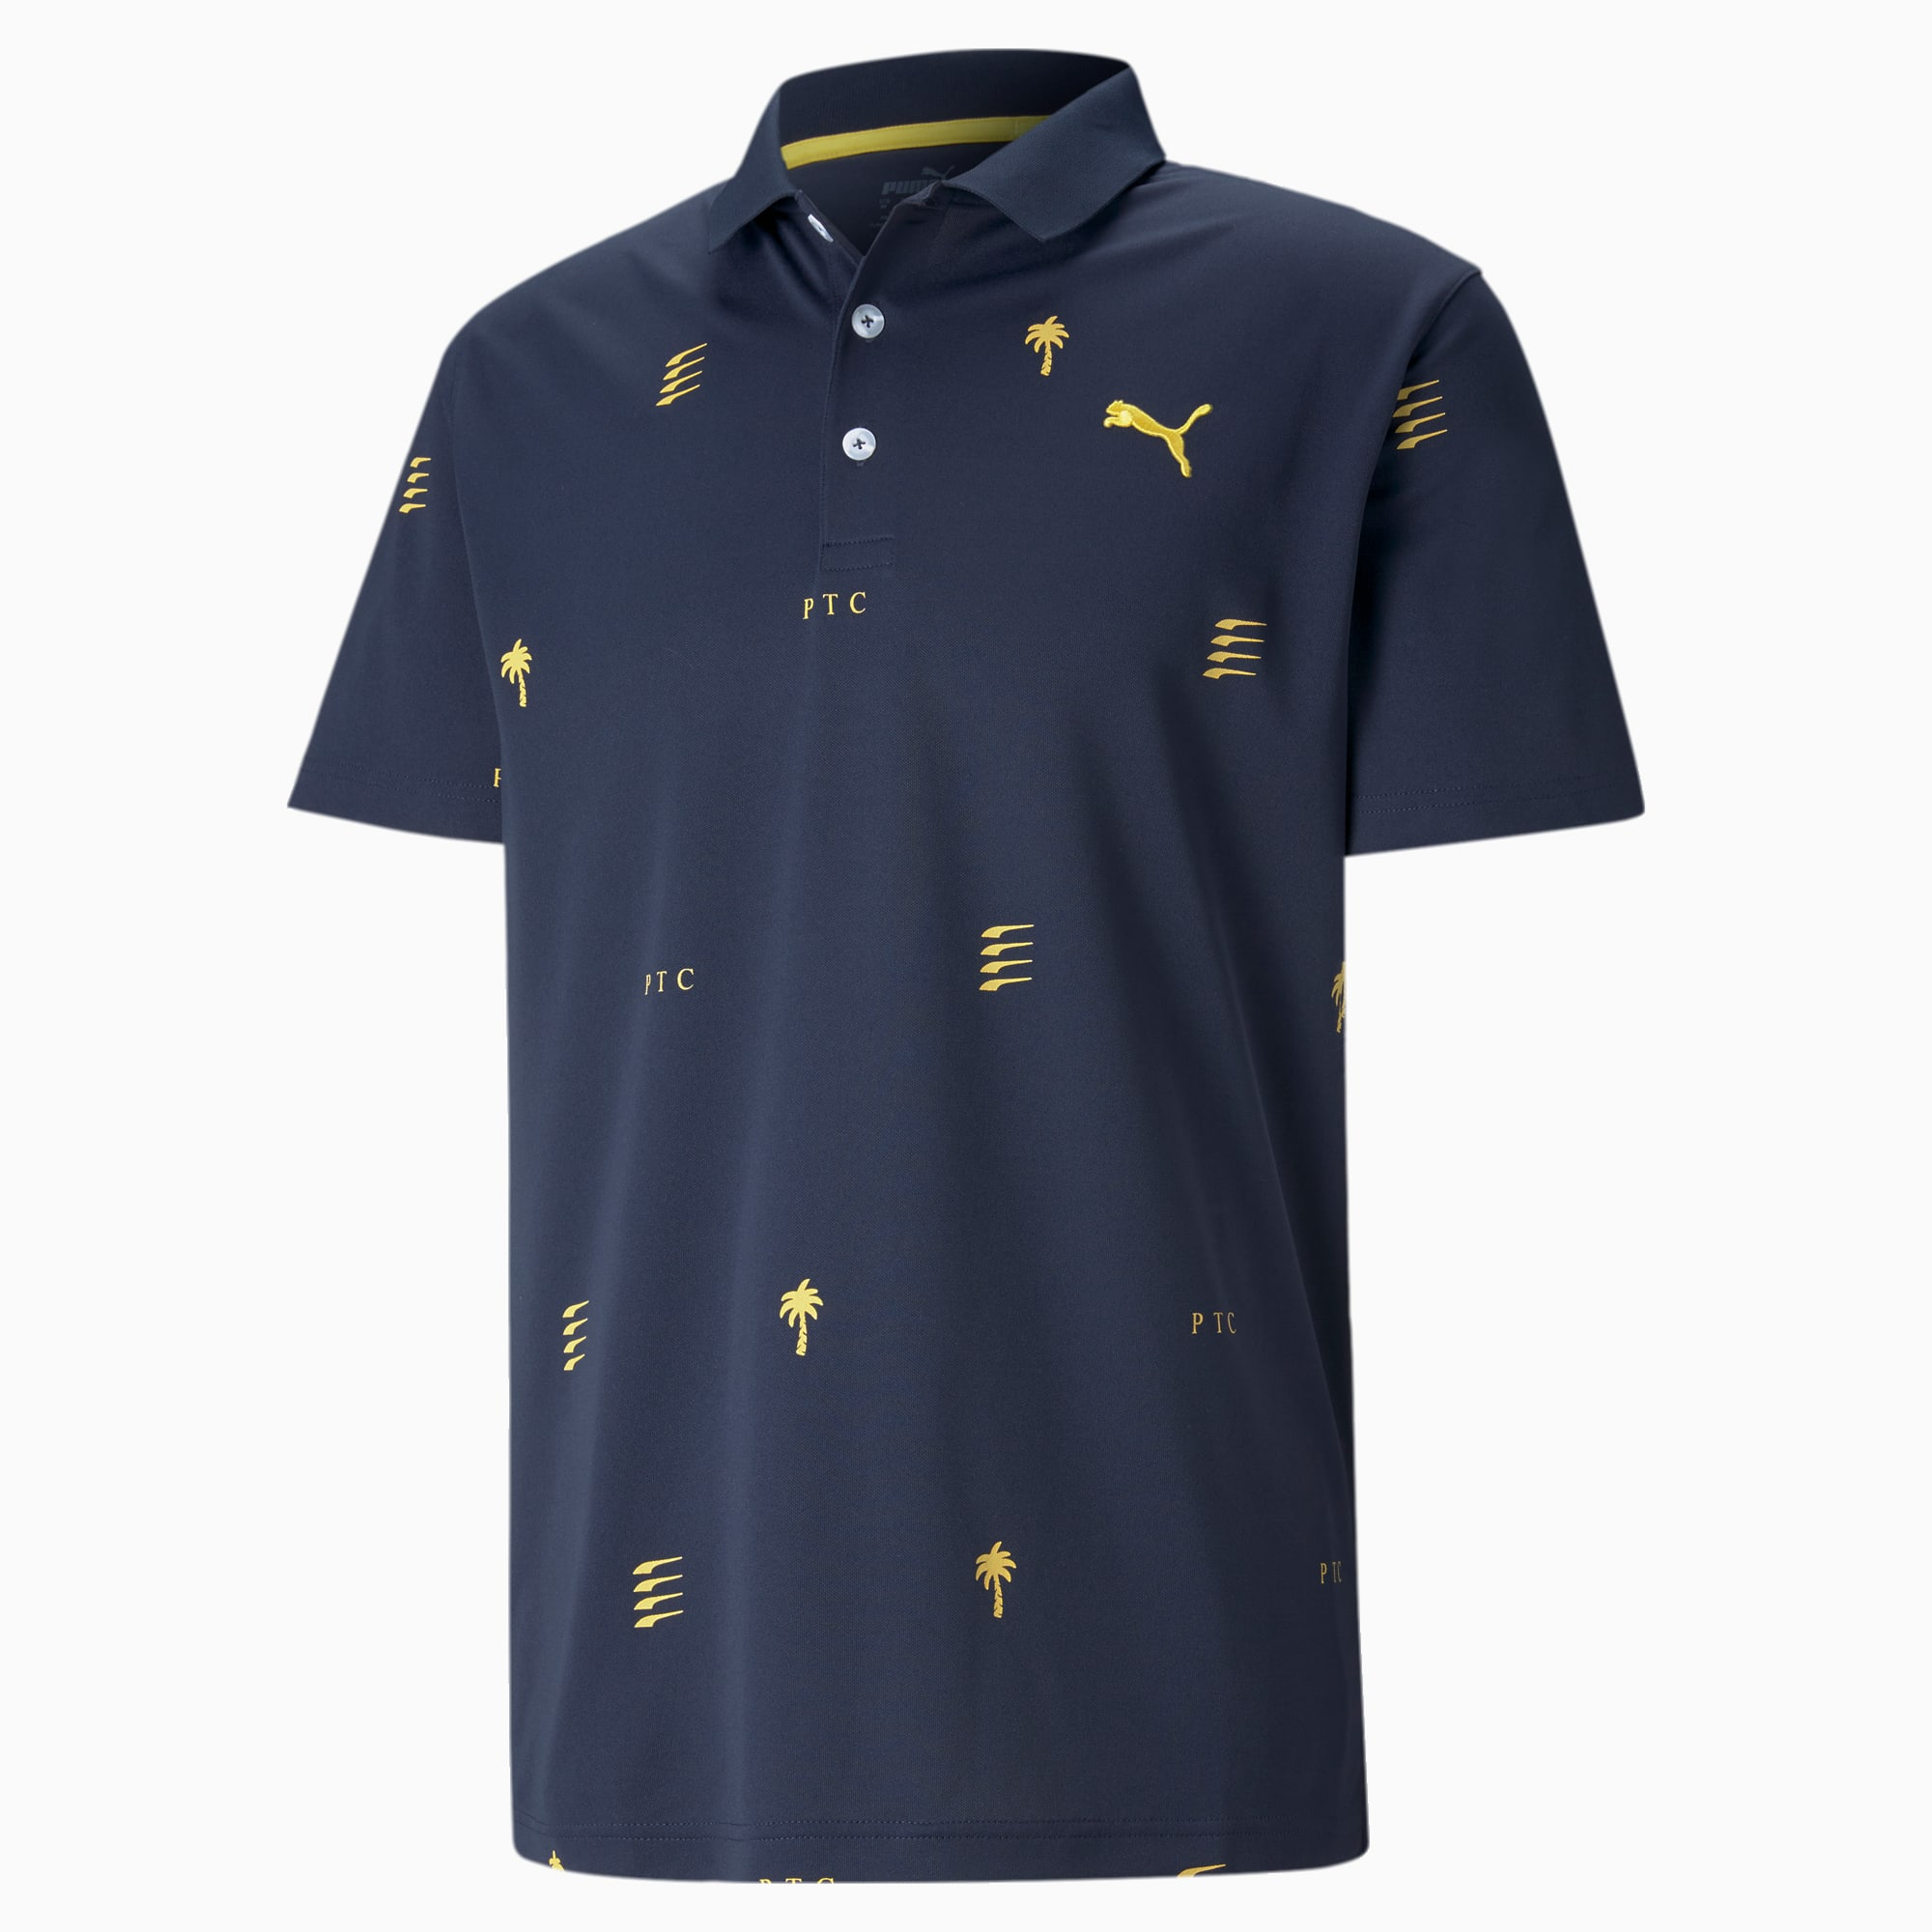 PUMA x PTC Edition golfpoloshirt heren, Blauw, Maat XL